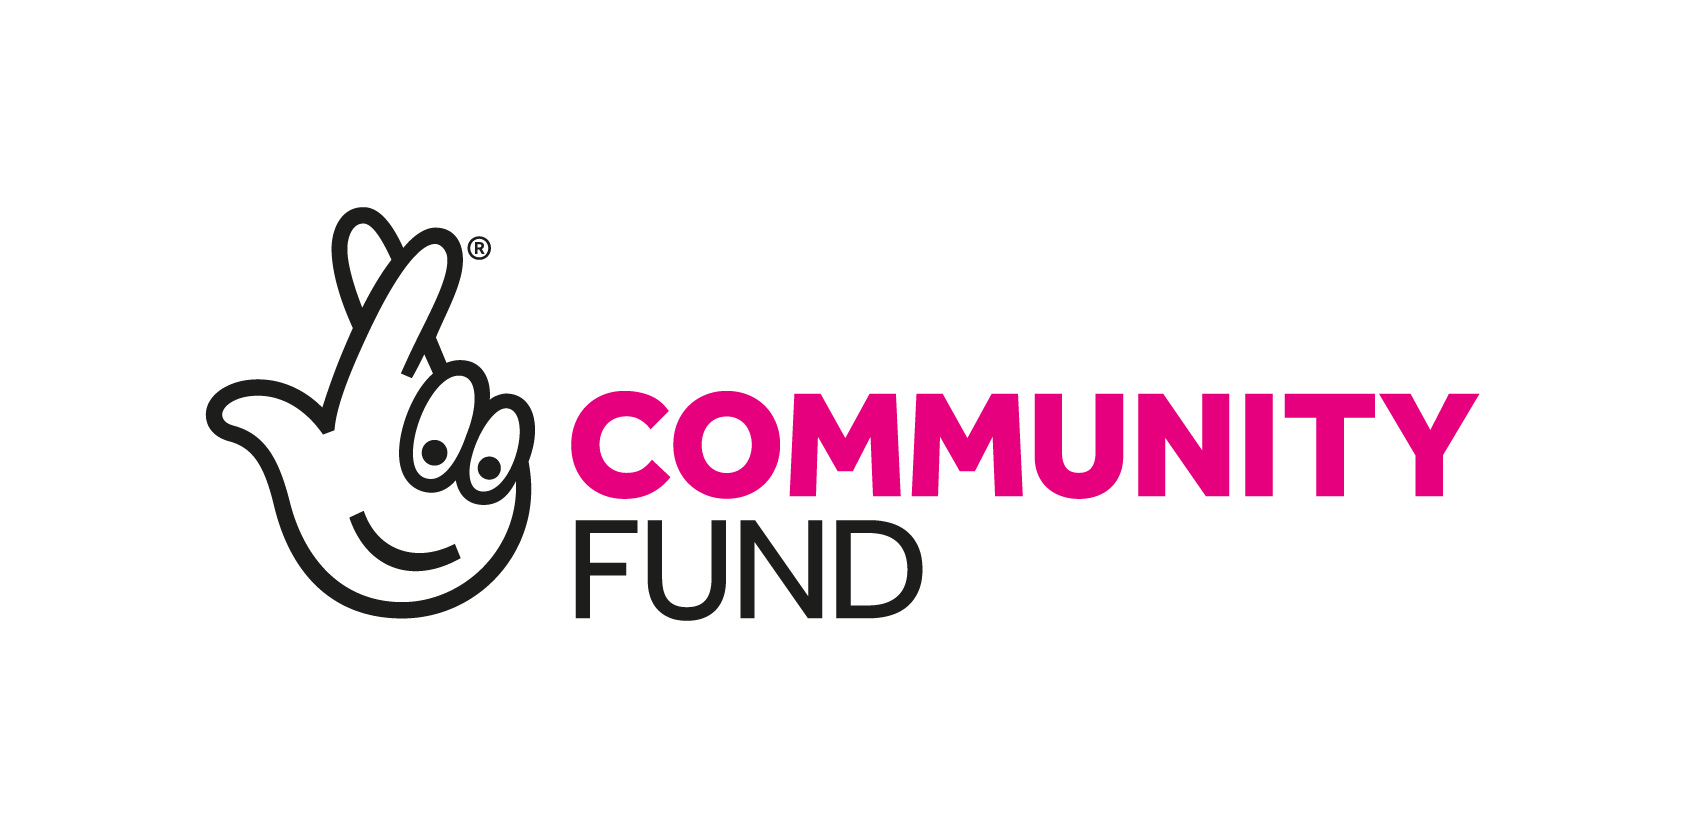 Lotter community fund logo